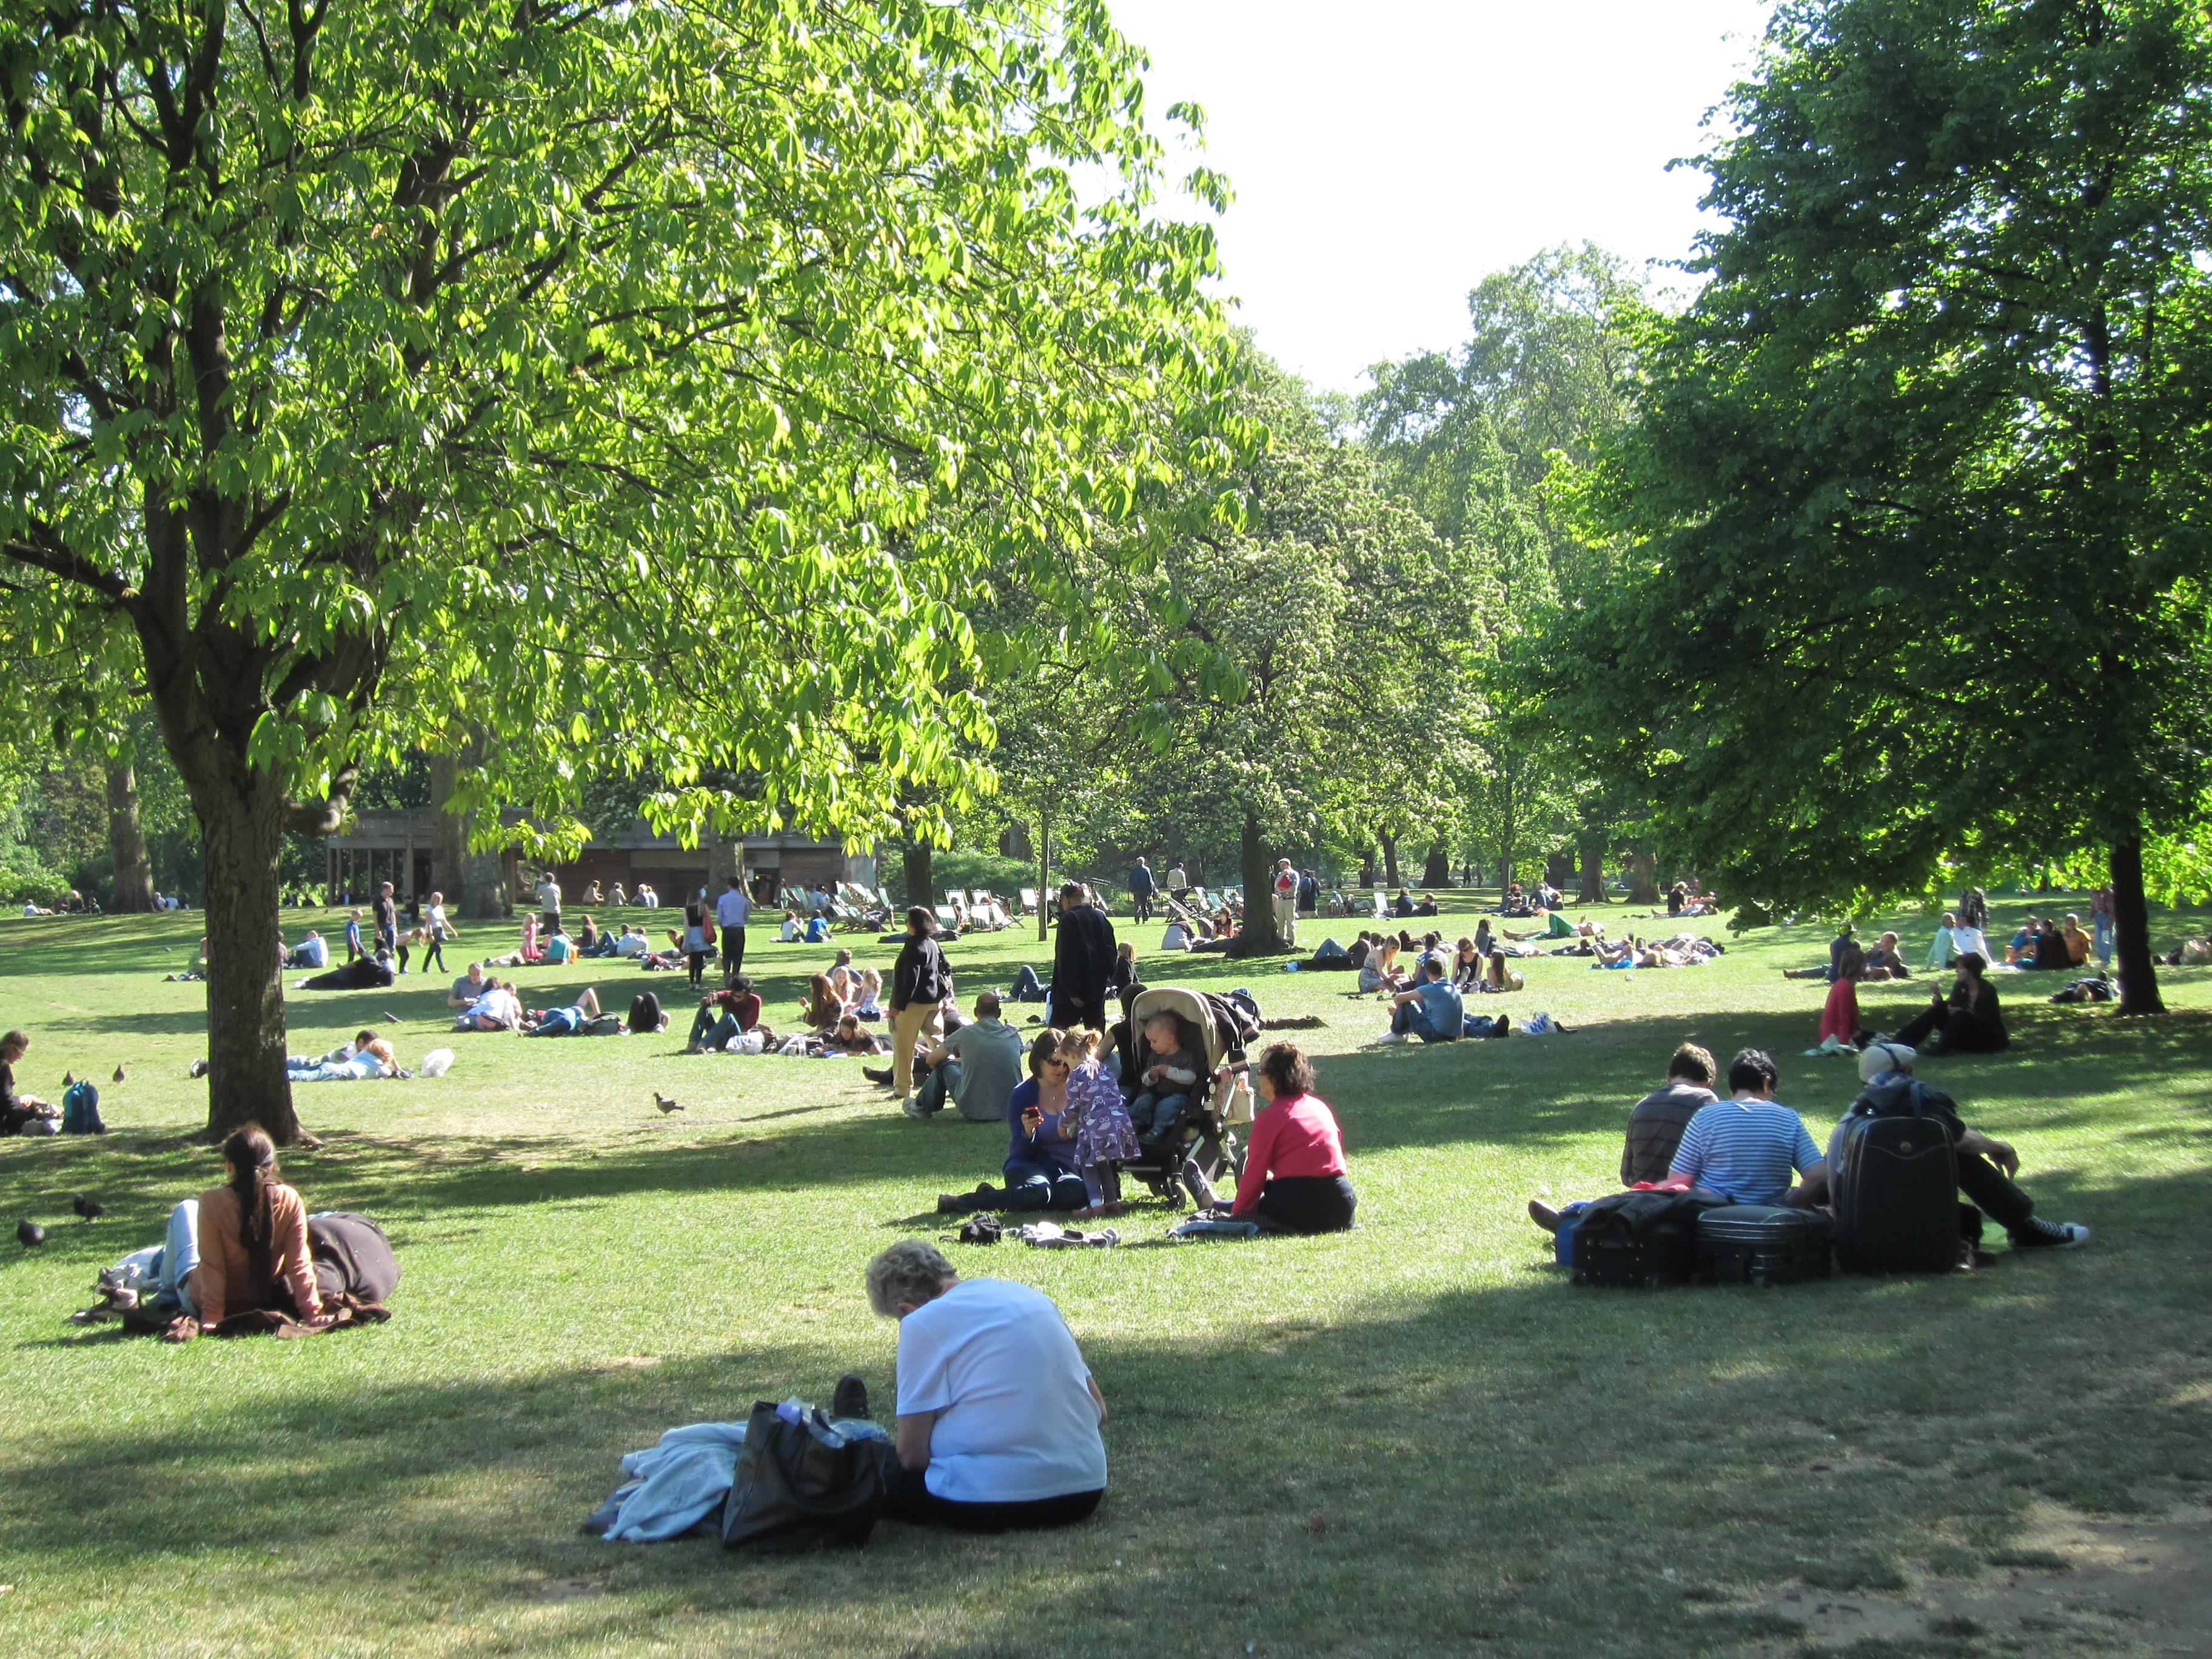 St. Jame's Park, London